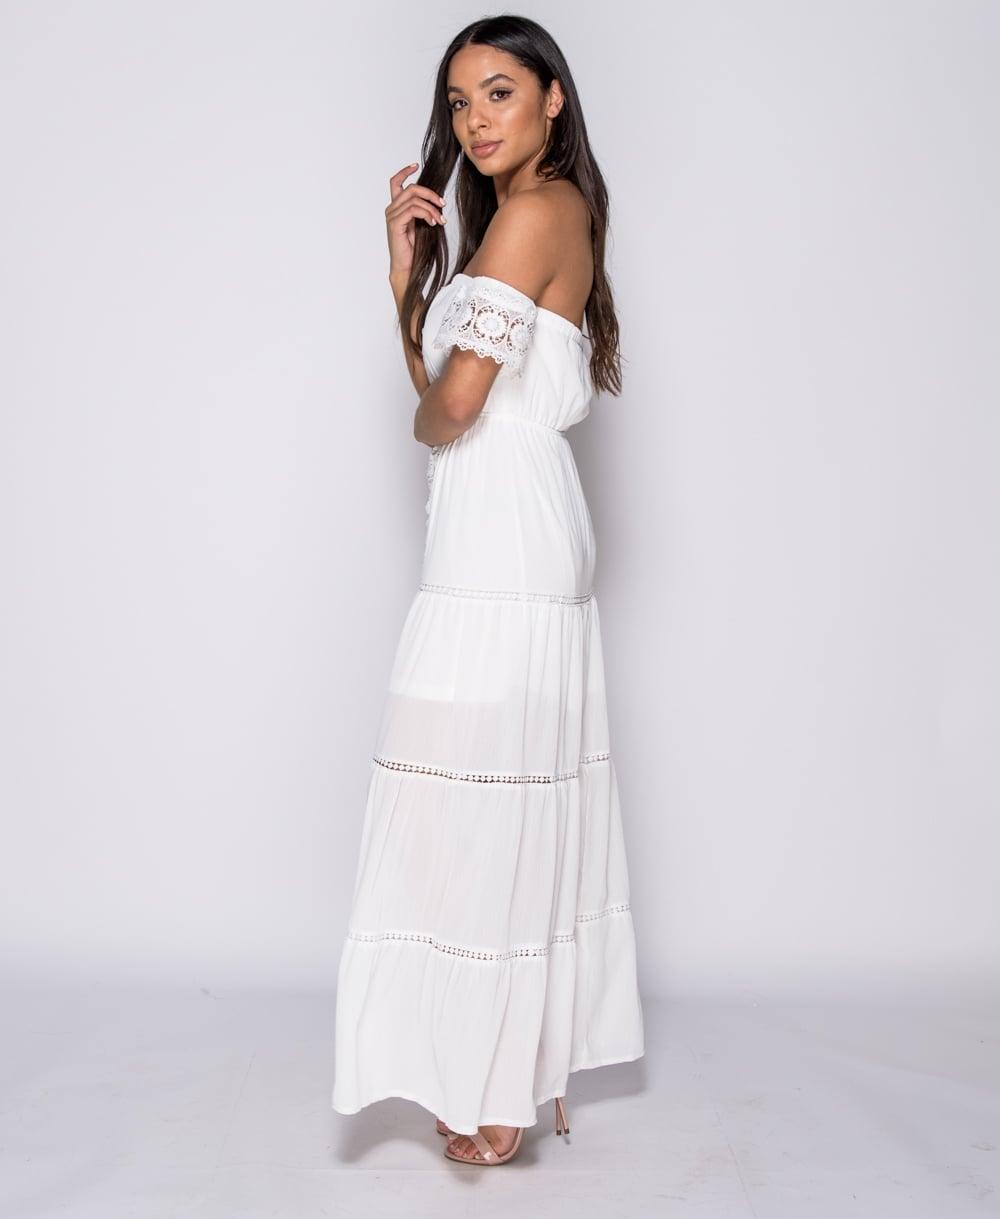 bohemian chic αέρινο total white φόρεμα crochet trim δαντέλα ... e84f96db8f0